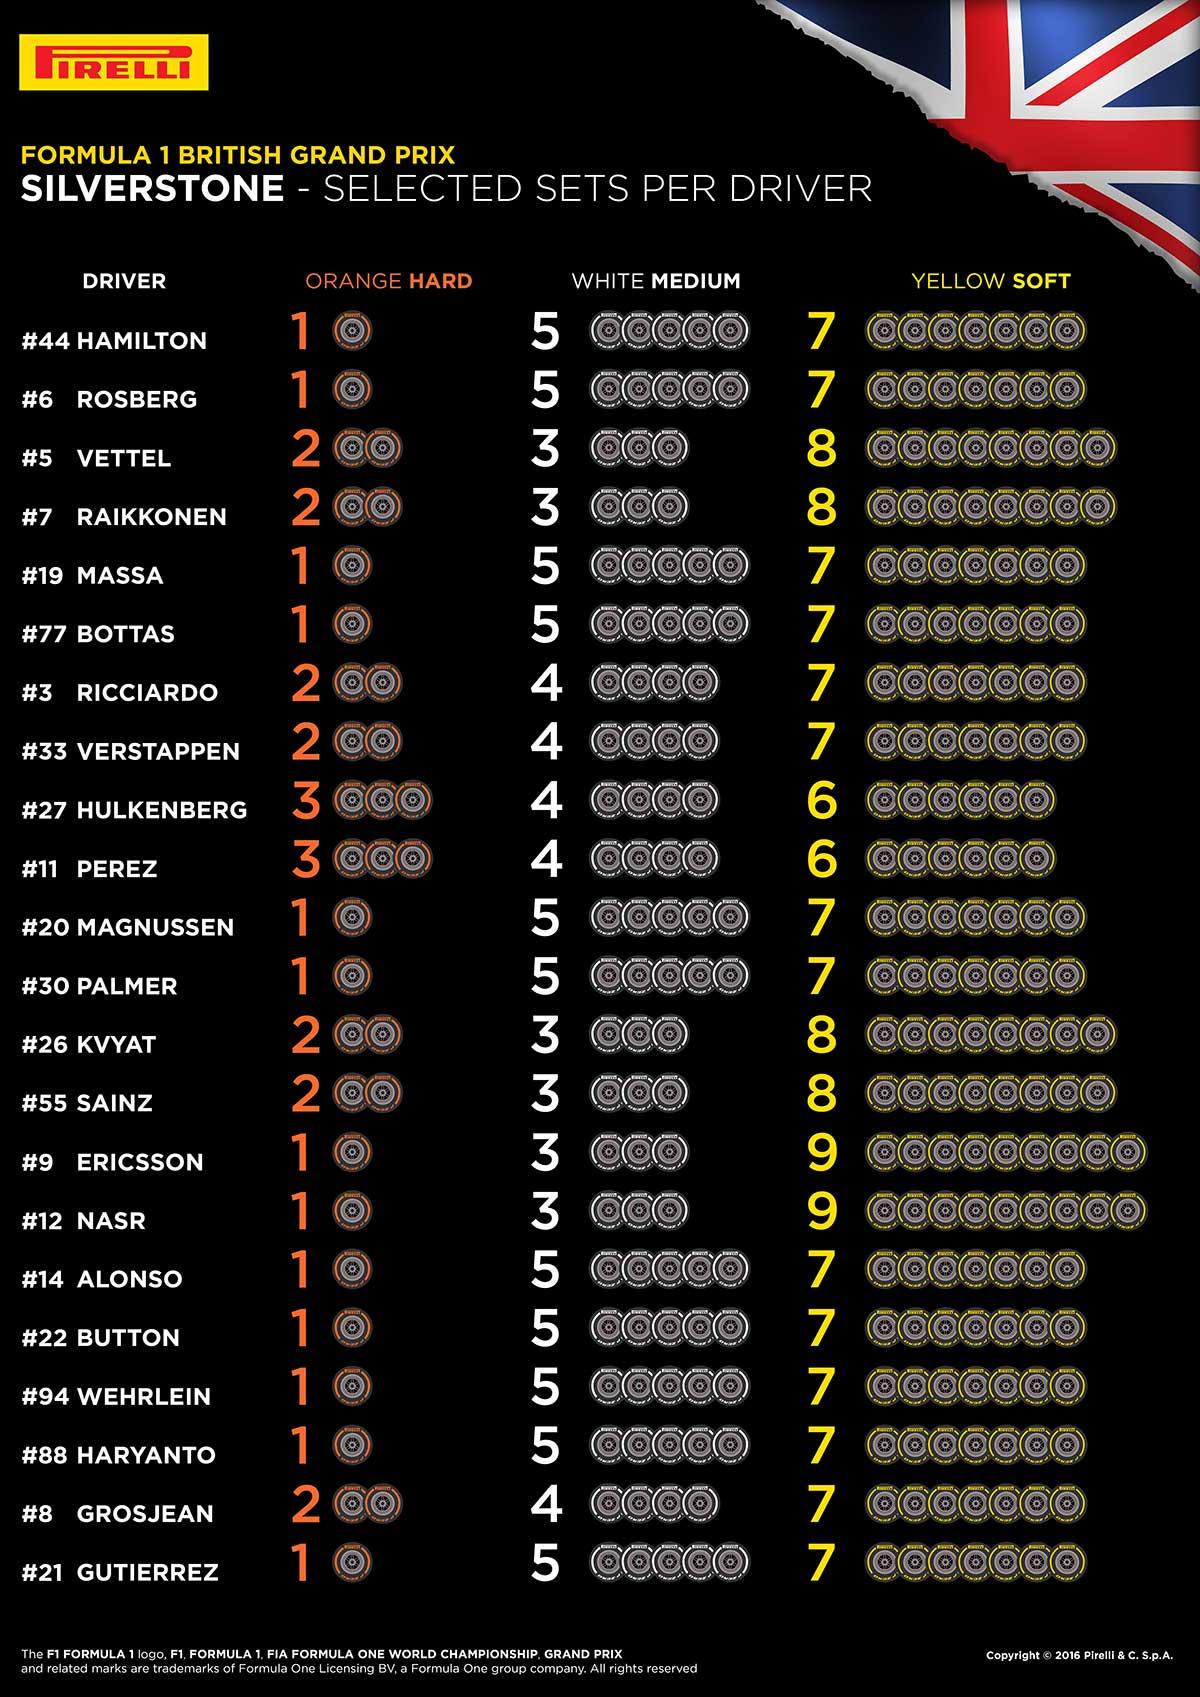 7911_GreatBritain-Selected-Sets-Per-Driver-EN